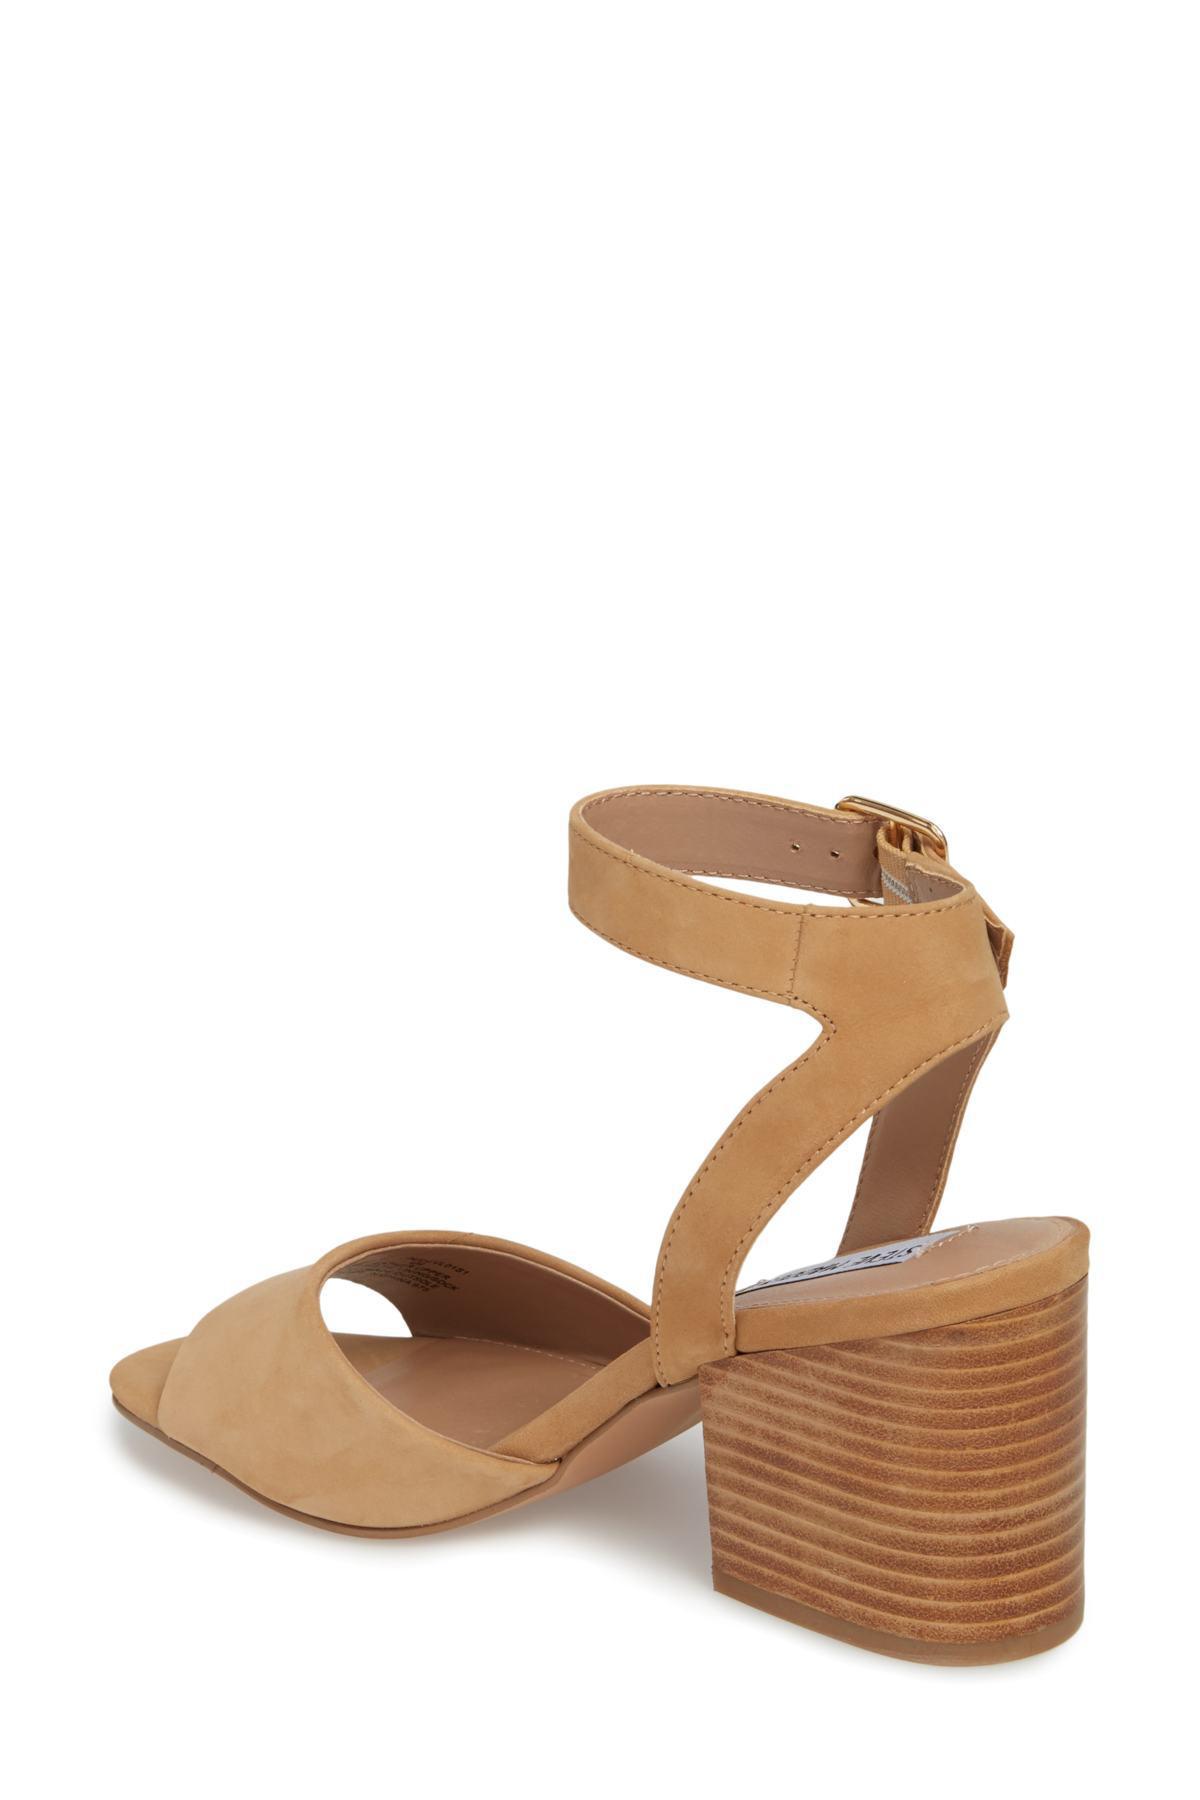 8264c31fa38 Lyst - Steve Madden Devlin Block Heel Sandal (women) in Brown